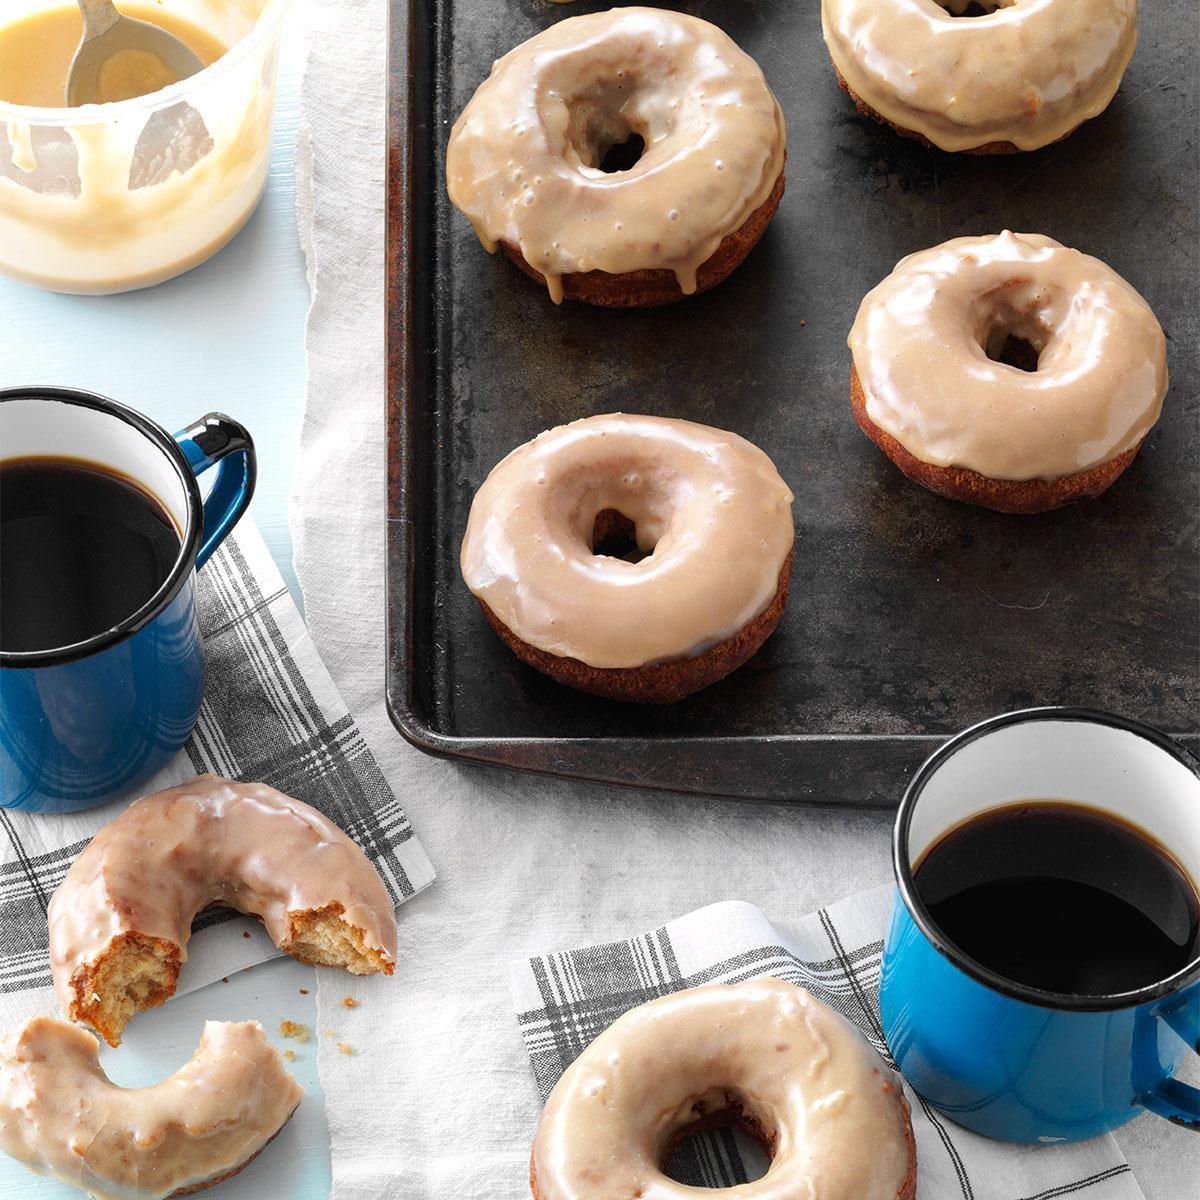 Maple Glaze for Doughnuts